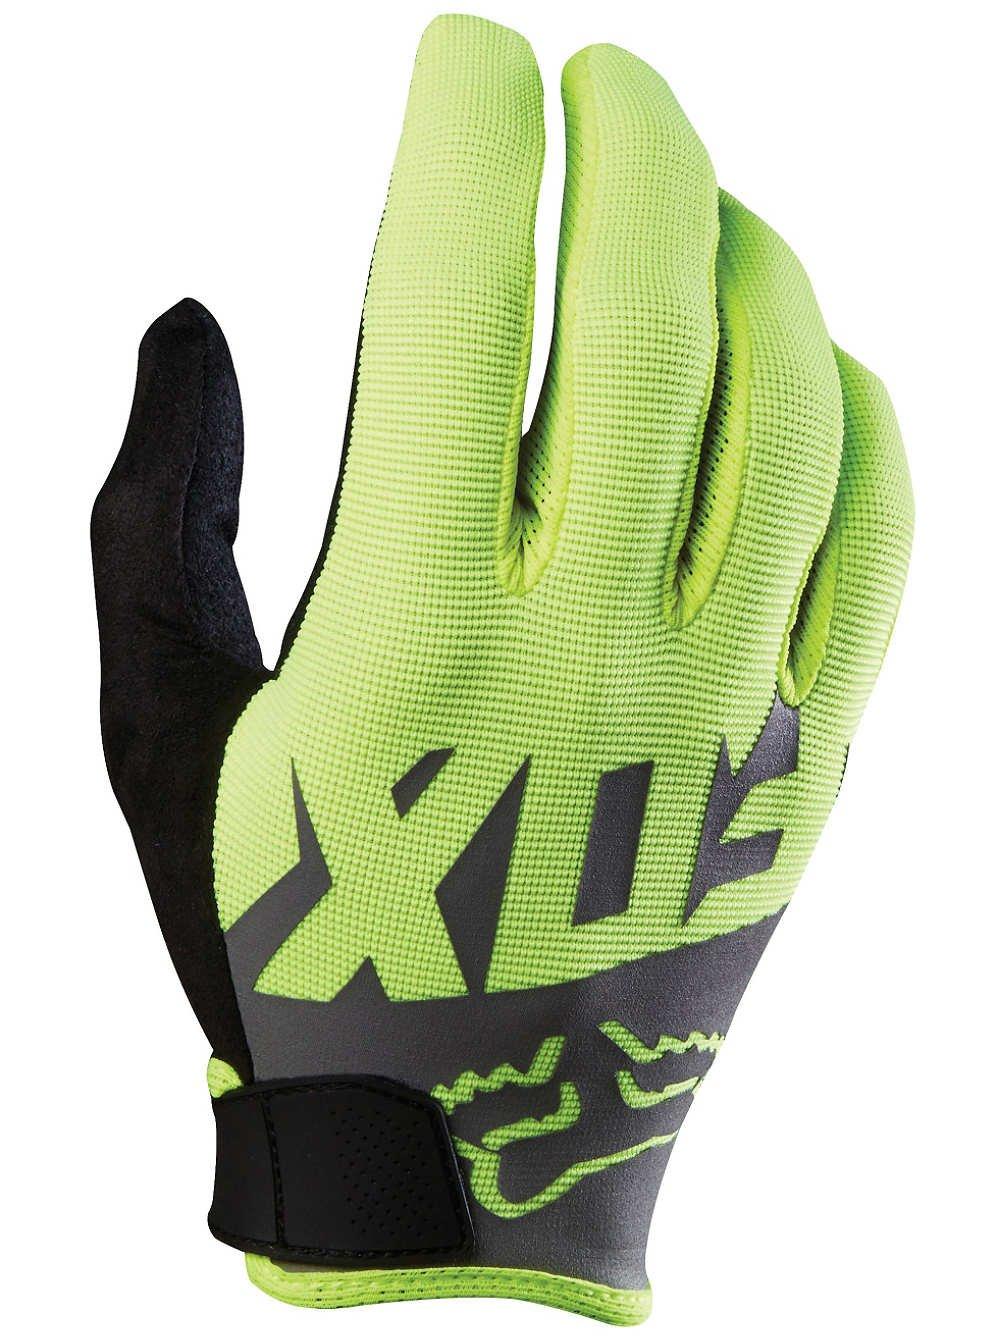 Fox Racing Ranger Gloves - Men's Flo Yellow, M